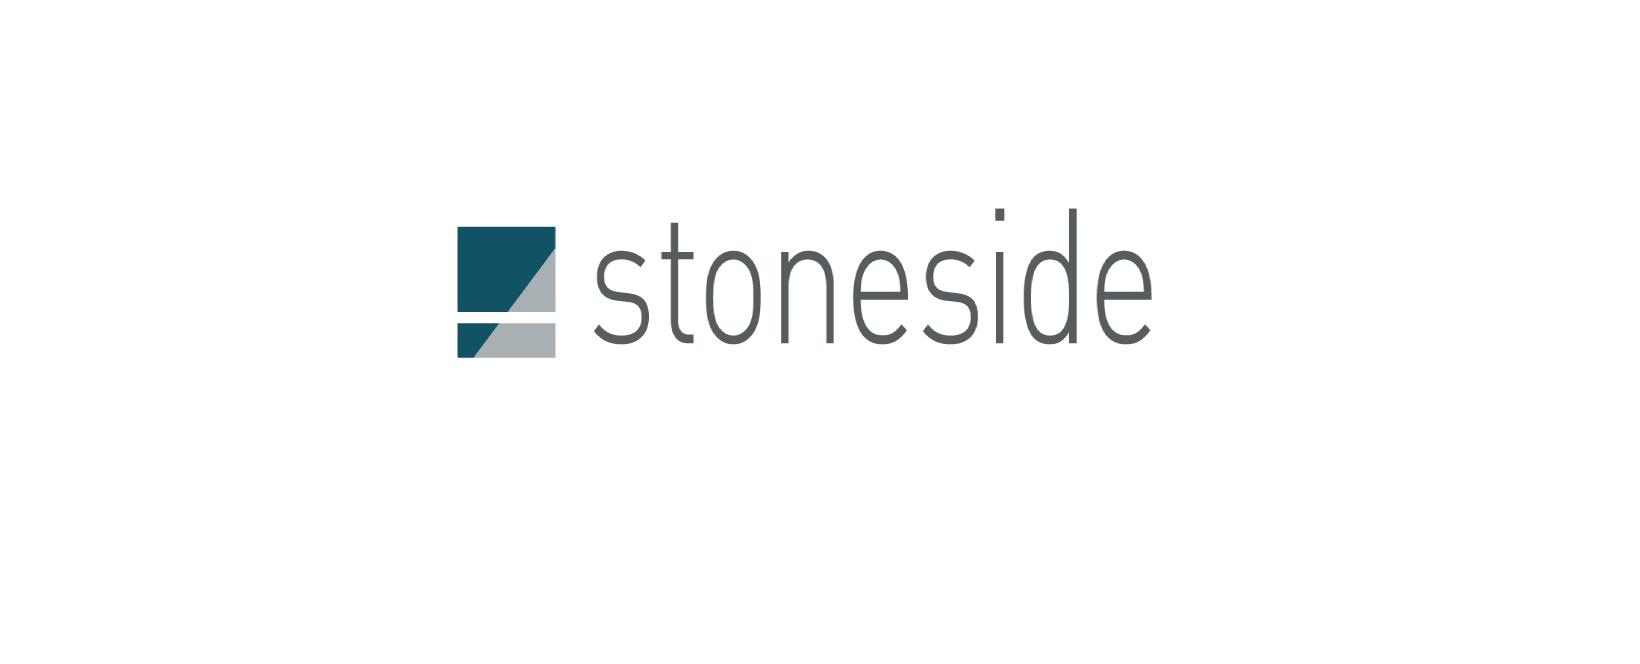 Stoneside Discount Code 2021